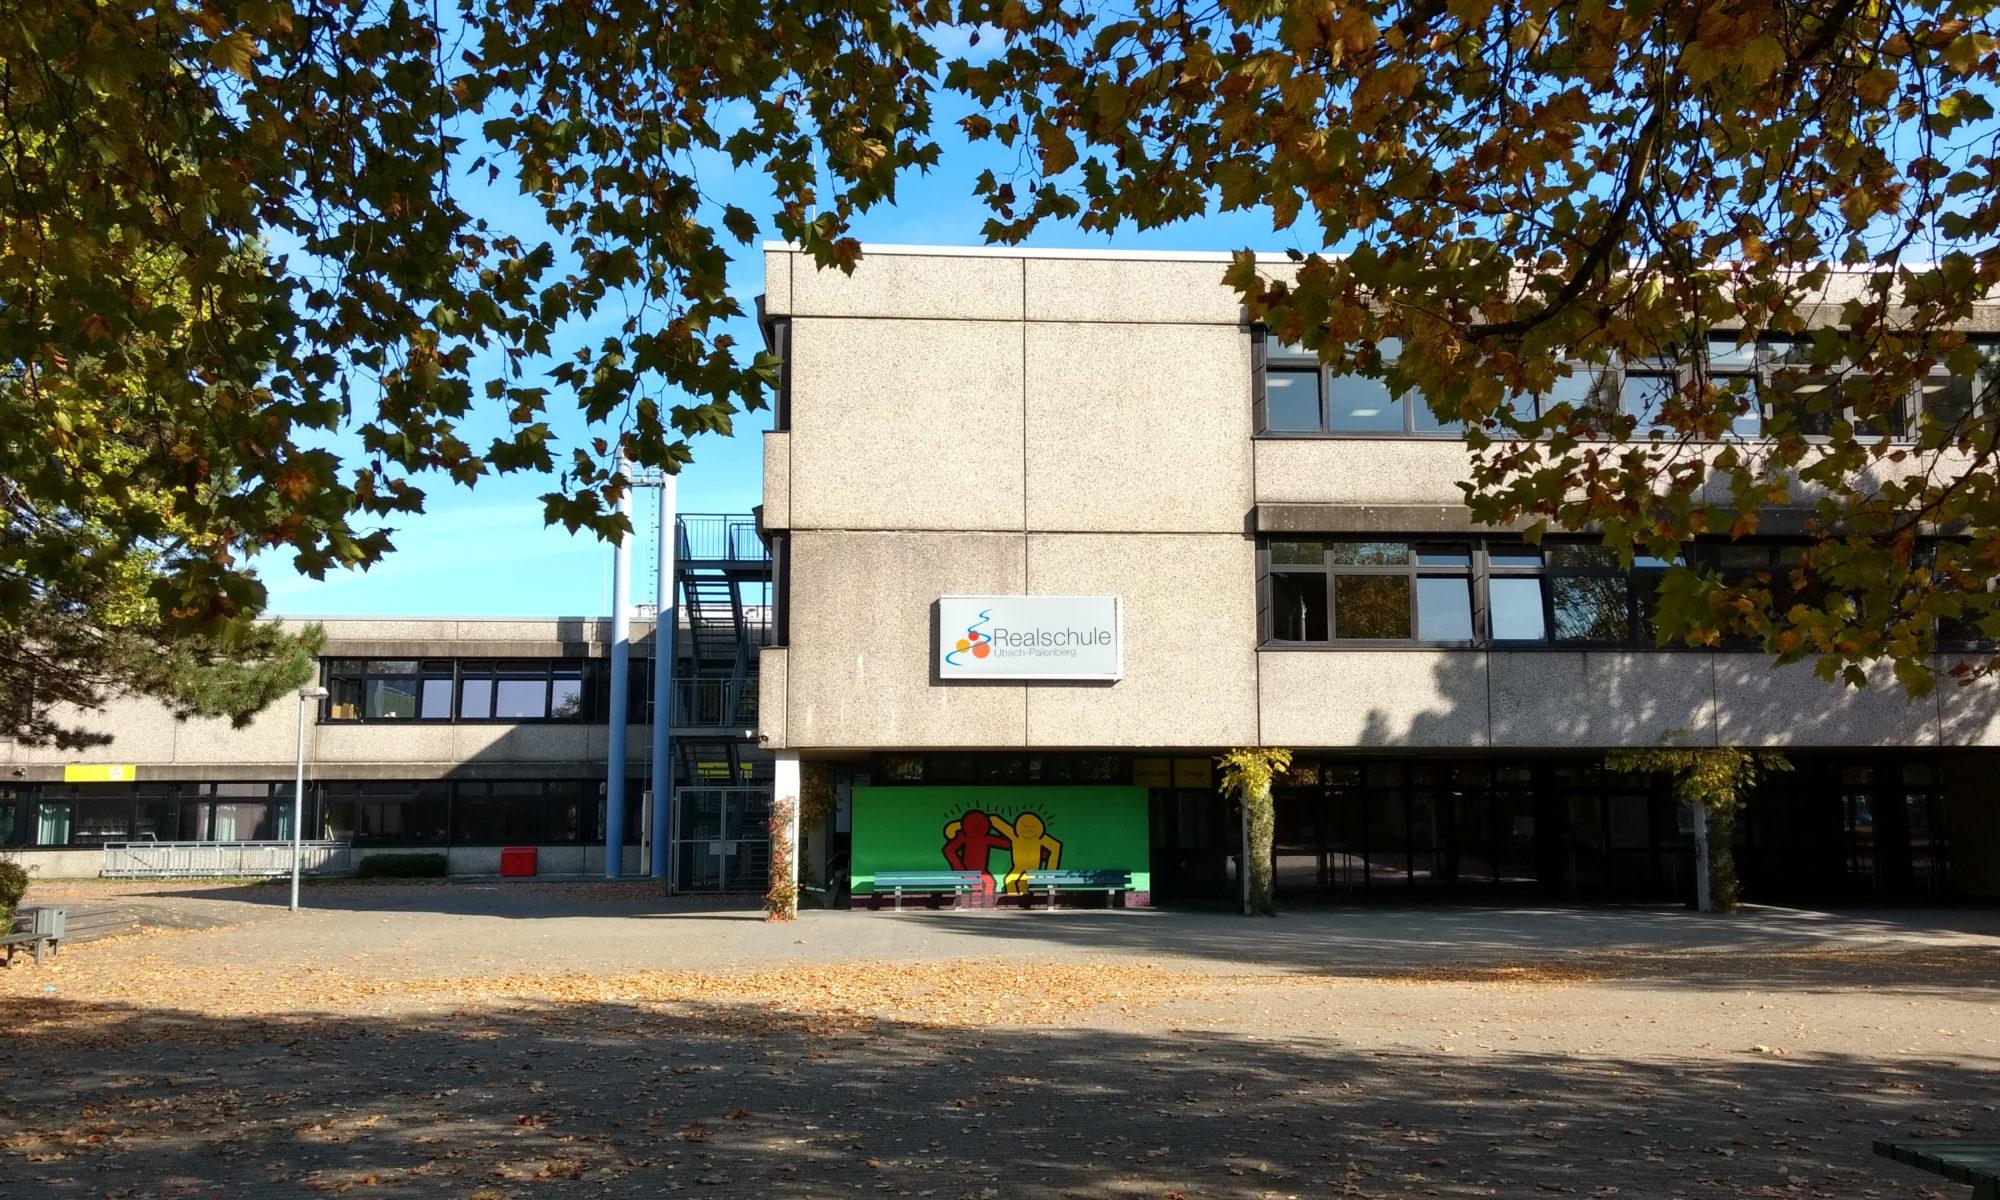 Realschule Übach-Palenberg